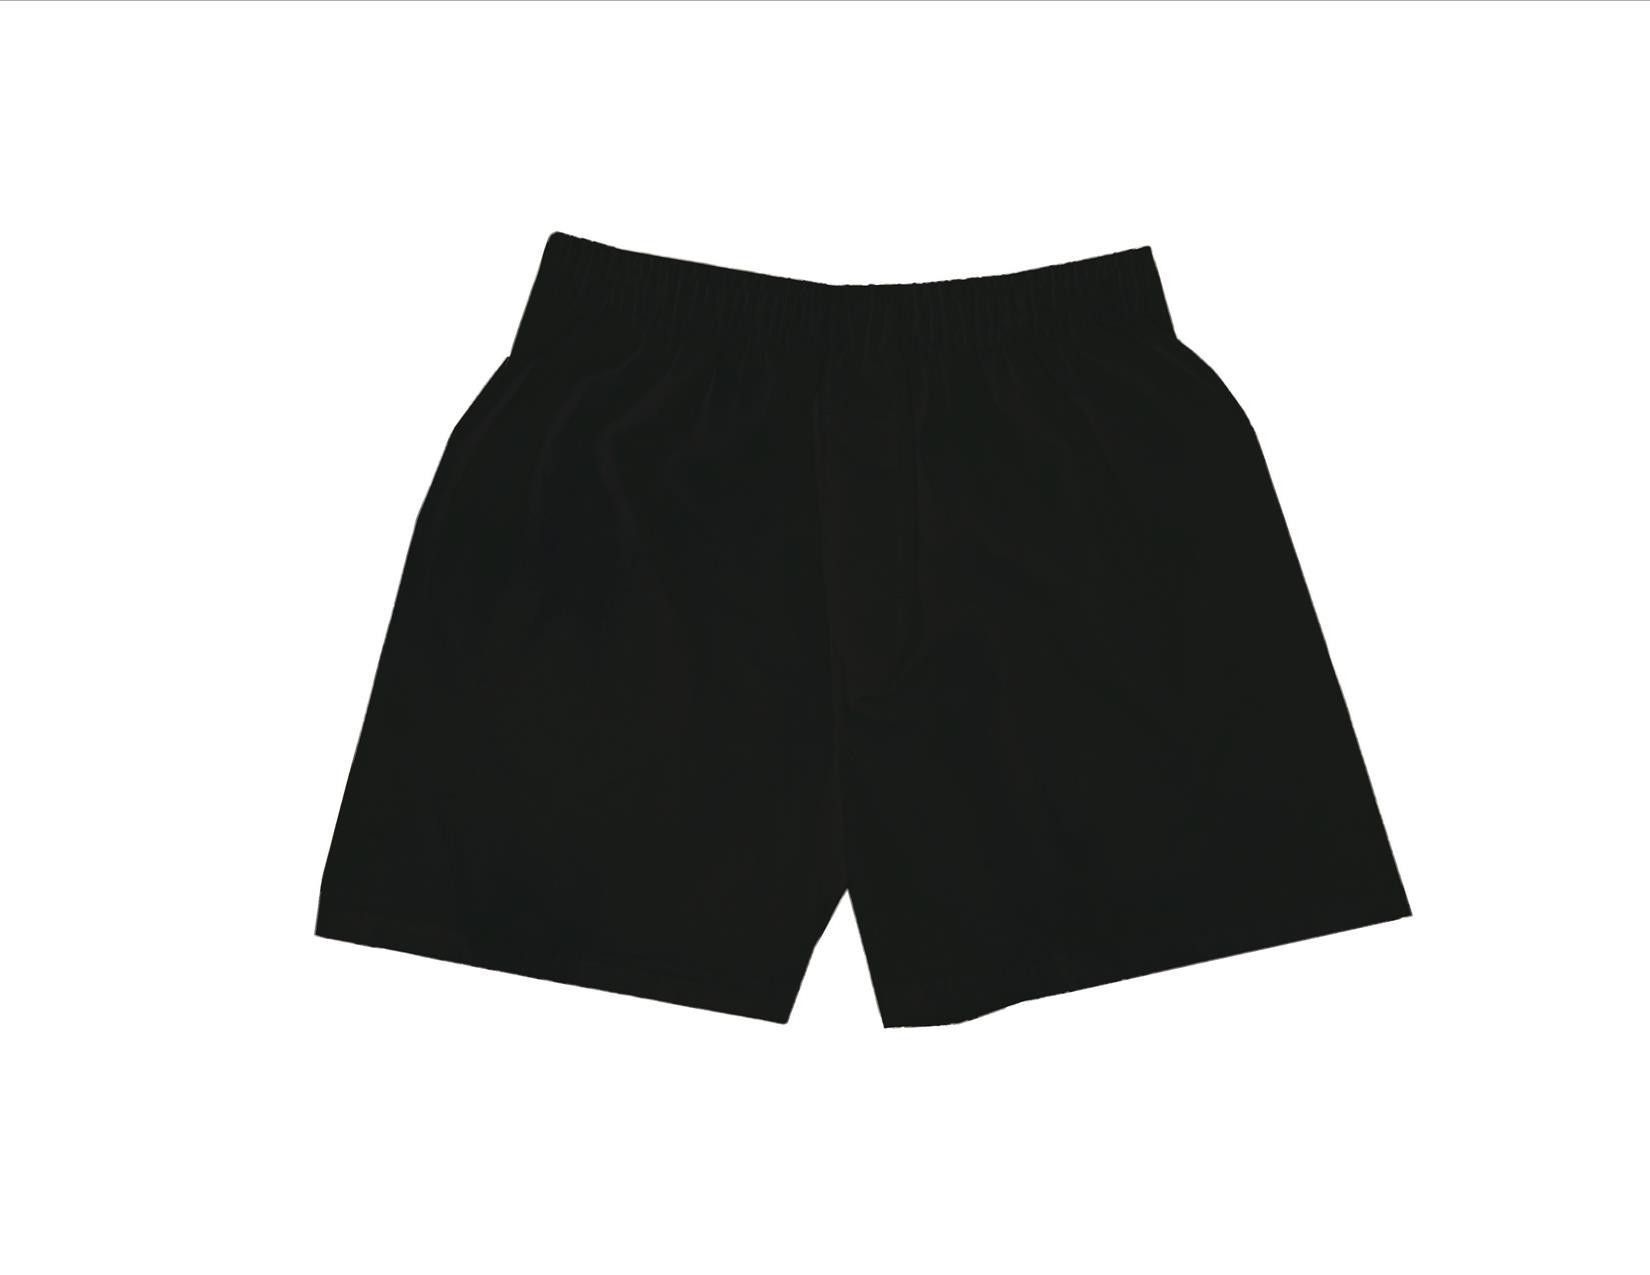 Boxercraft Men's Woven Cotton Boxer Sleep Shorts